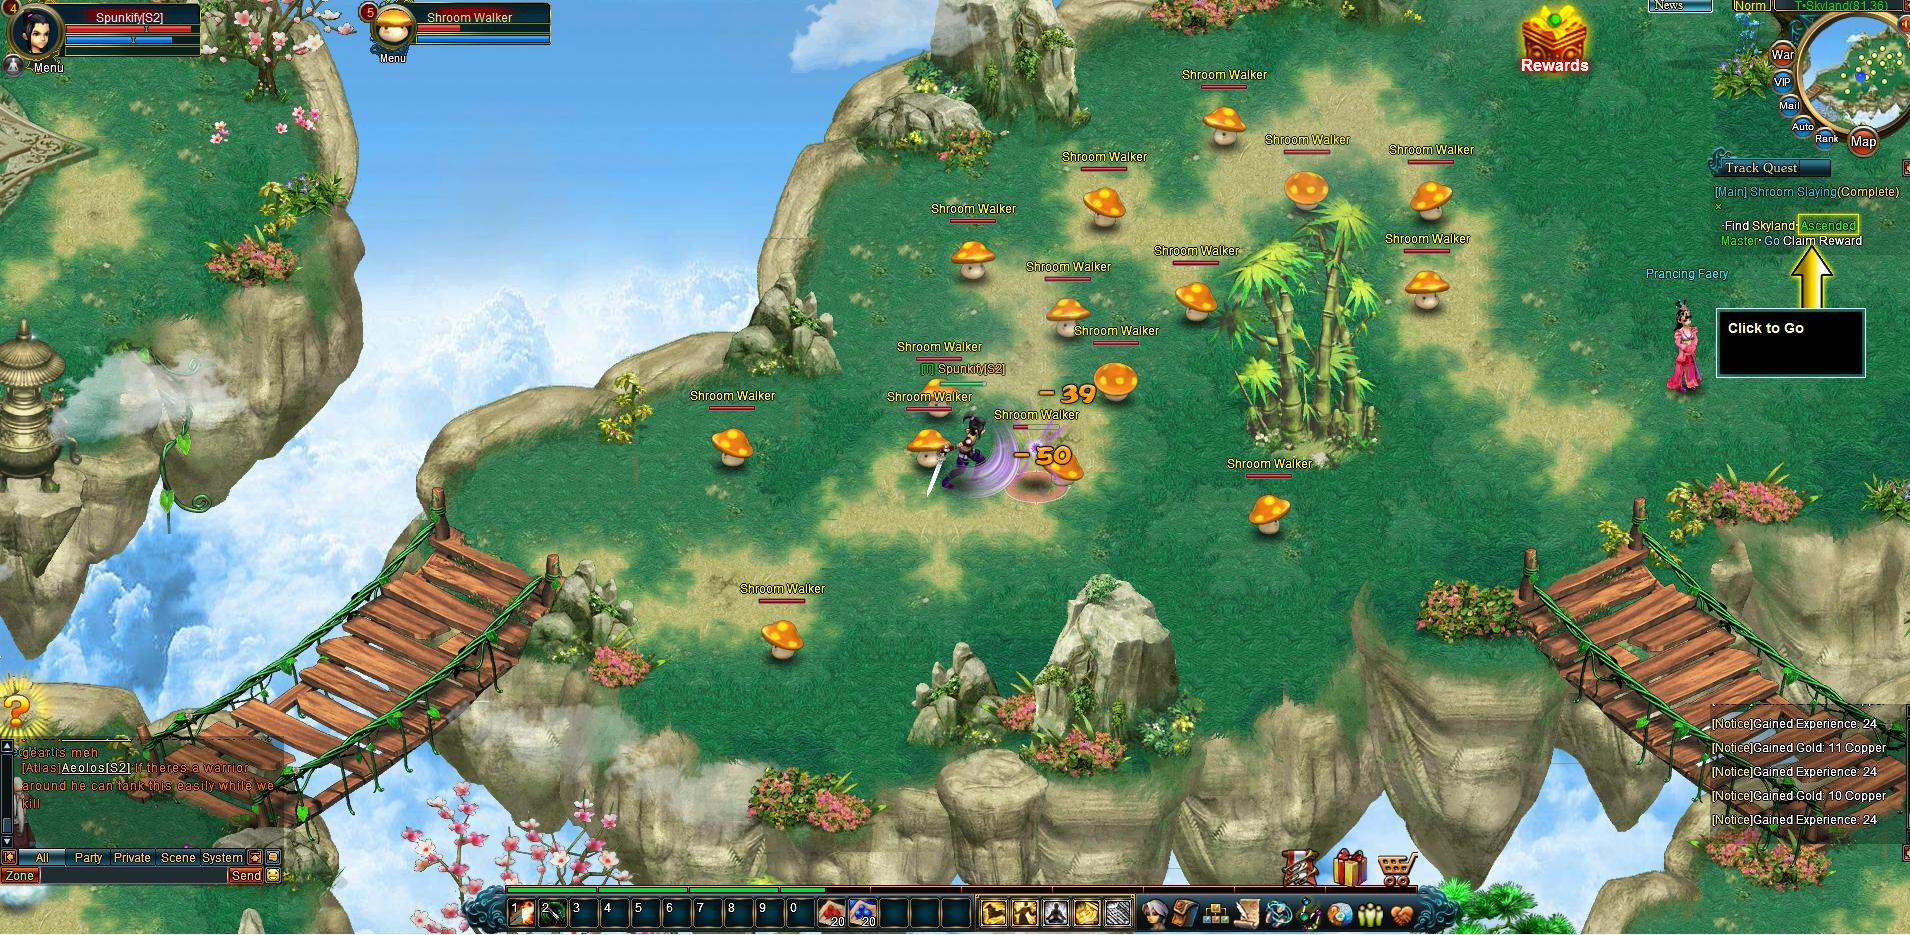 Mythic-Saga-combat-screenshots-2